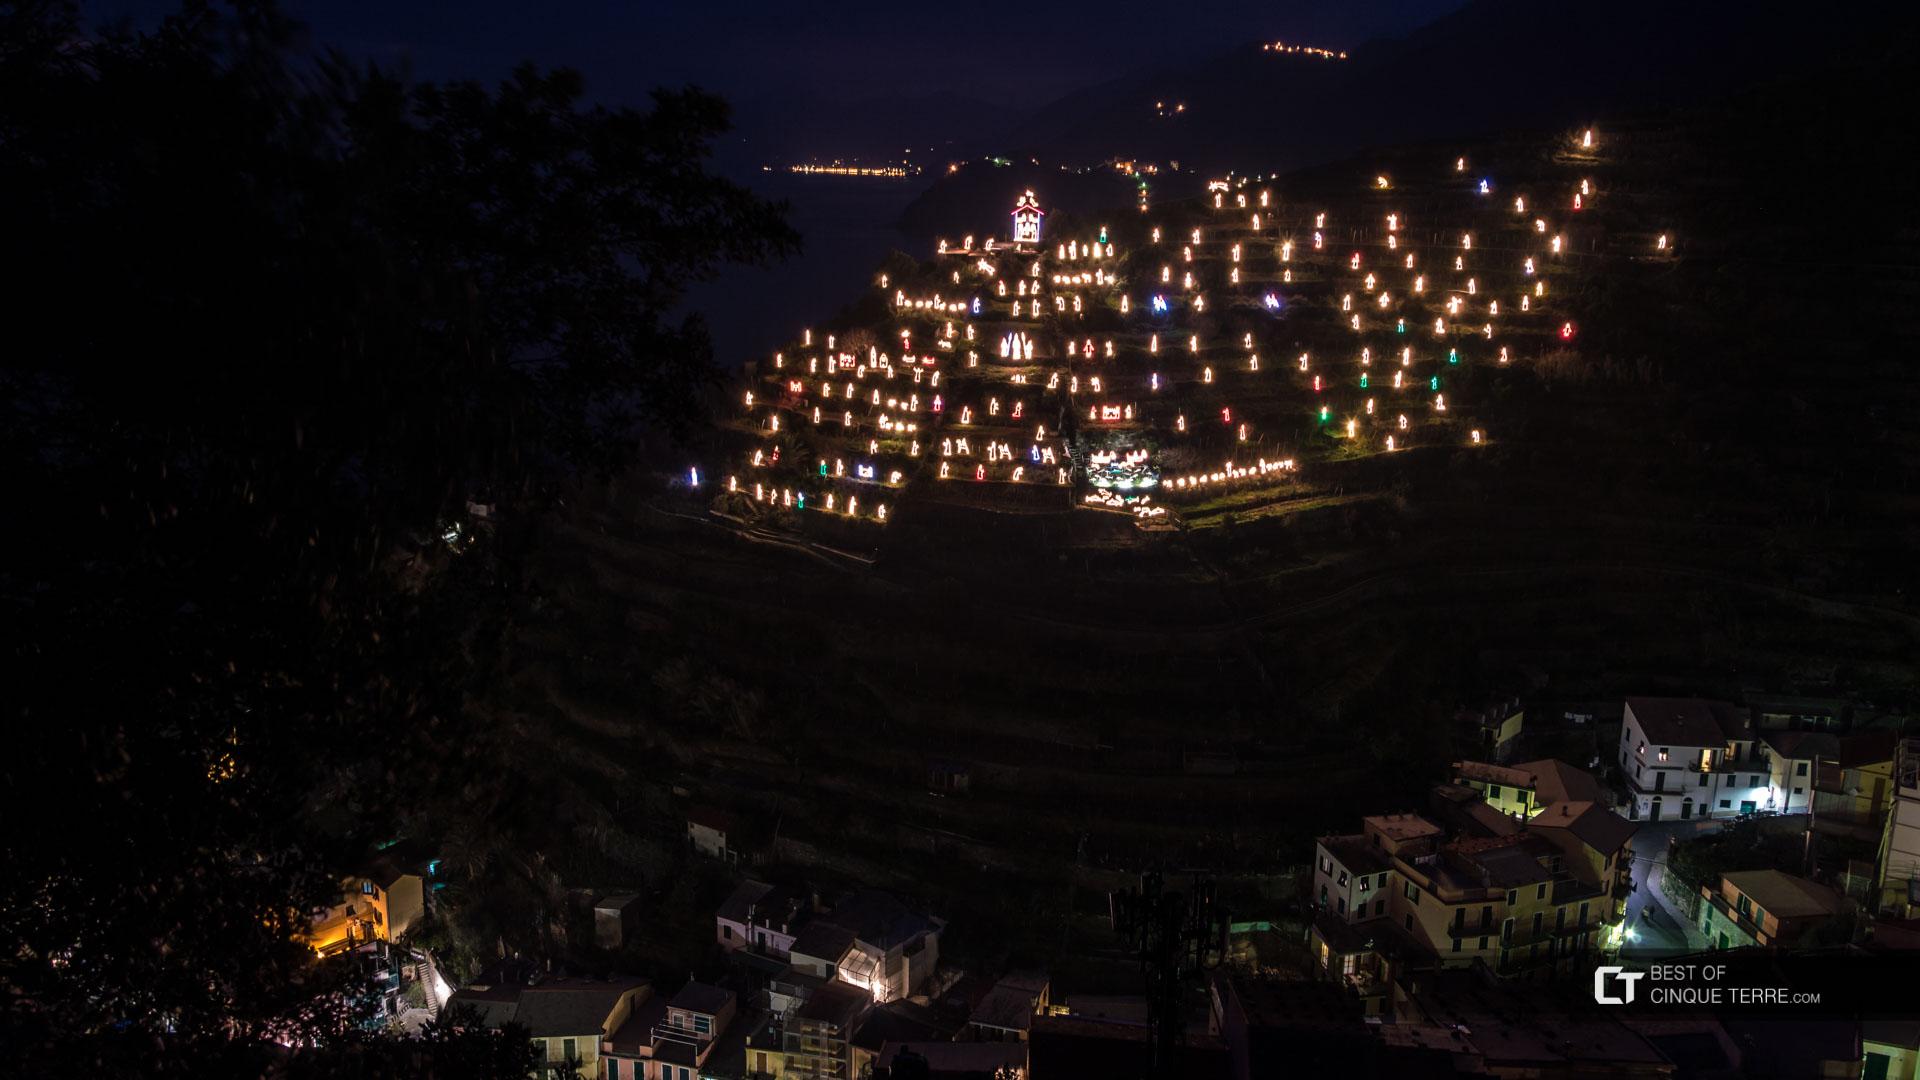 cinque-terre-manarola-christmas-nativity-scene-presepe-3_bg